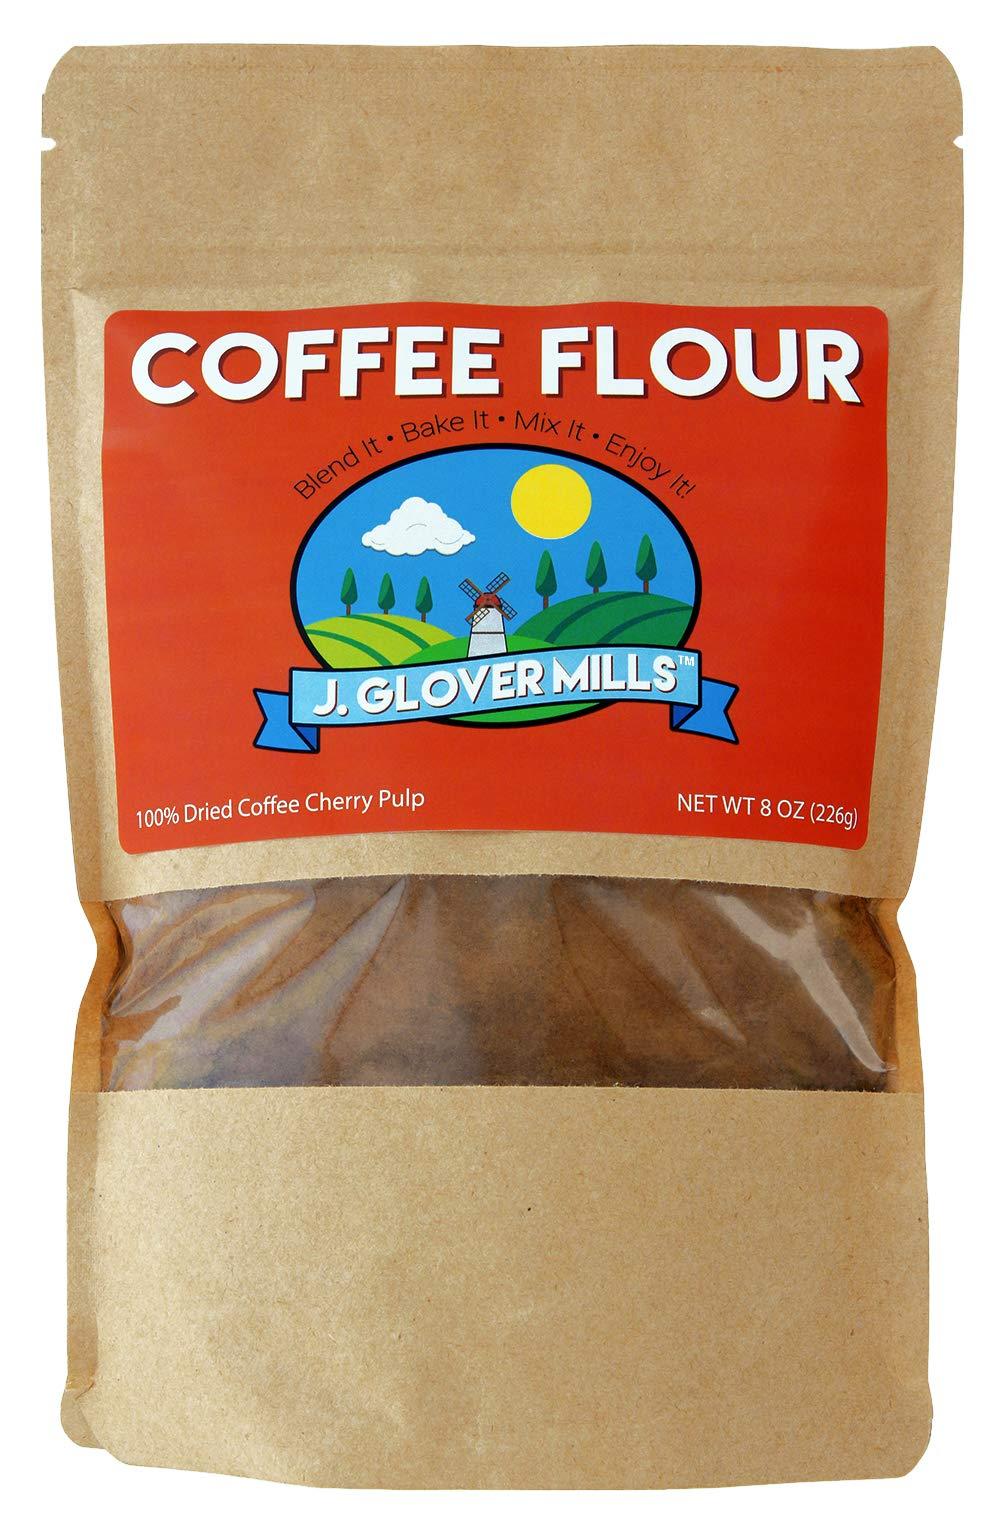 Coffee Flour - J.Glover Mills - 100% All Natural Coffee Flour - Sustainable Vegan Superfood with Antioxidants, Iron, Fiber, Potassium & Protein! - Blend It! Bake it! Love it!